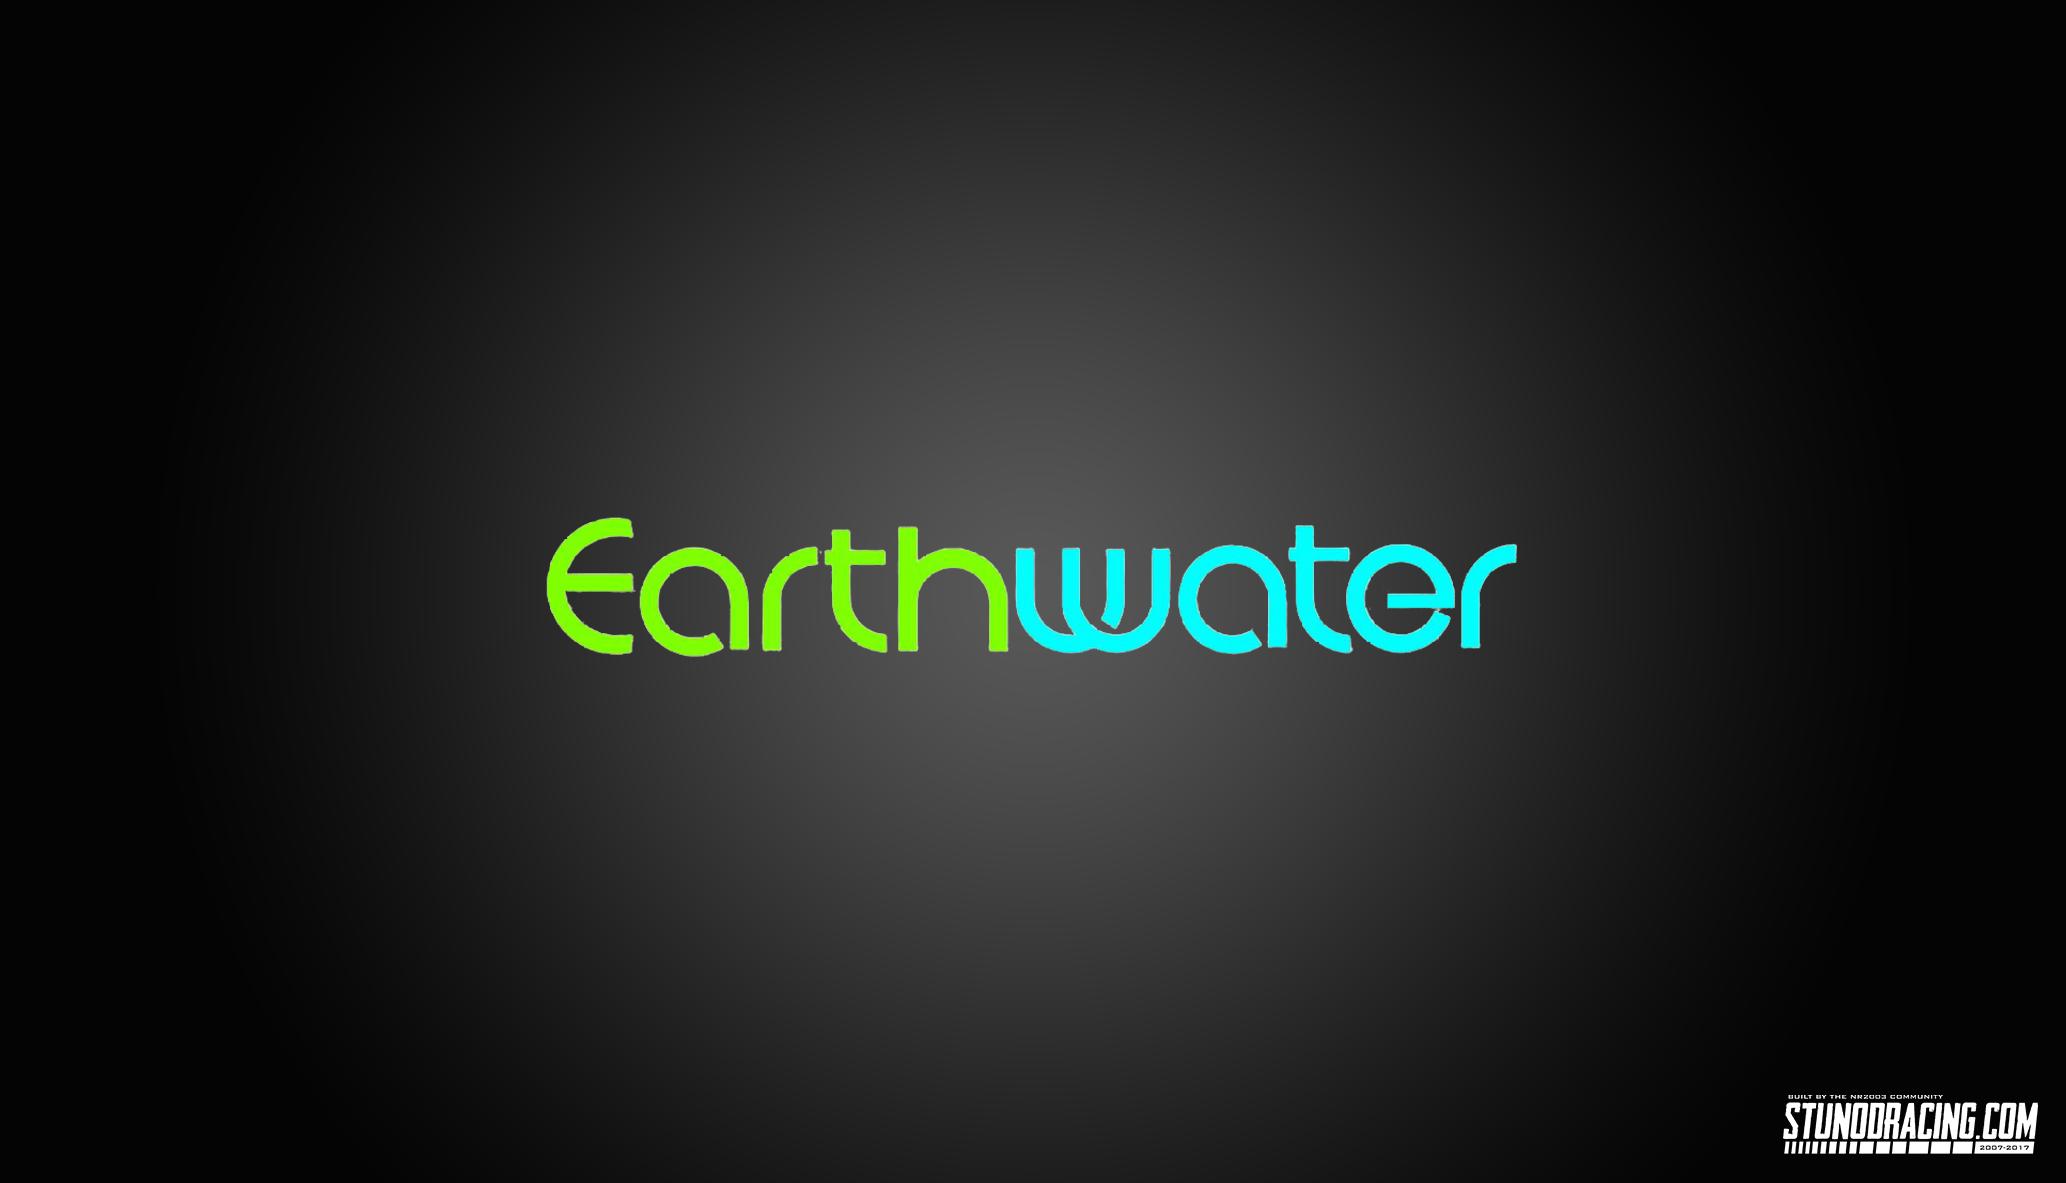 StunodRacing-Earthwater-Logo.png